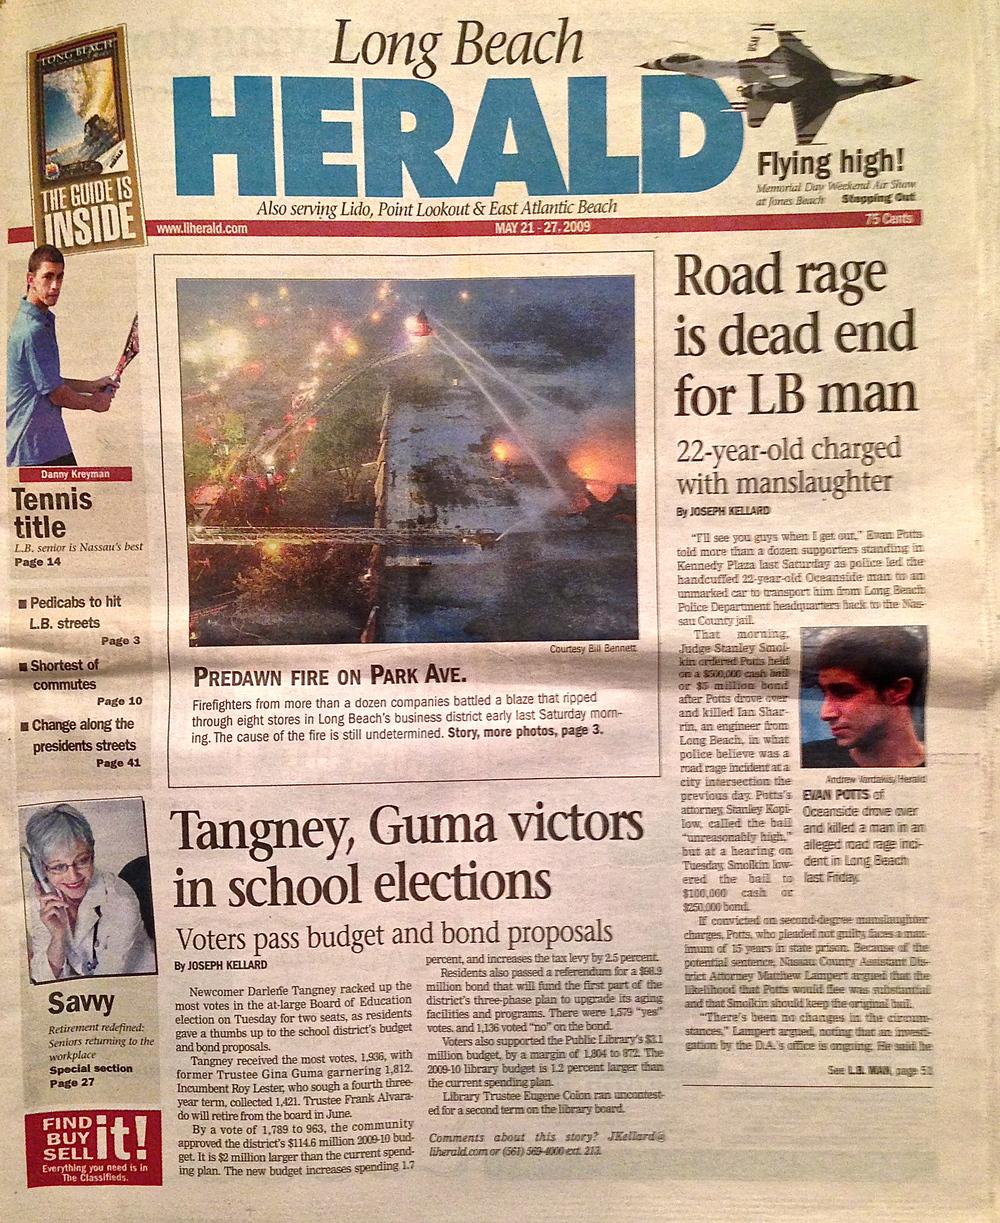 @ Herald-1.JPG